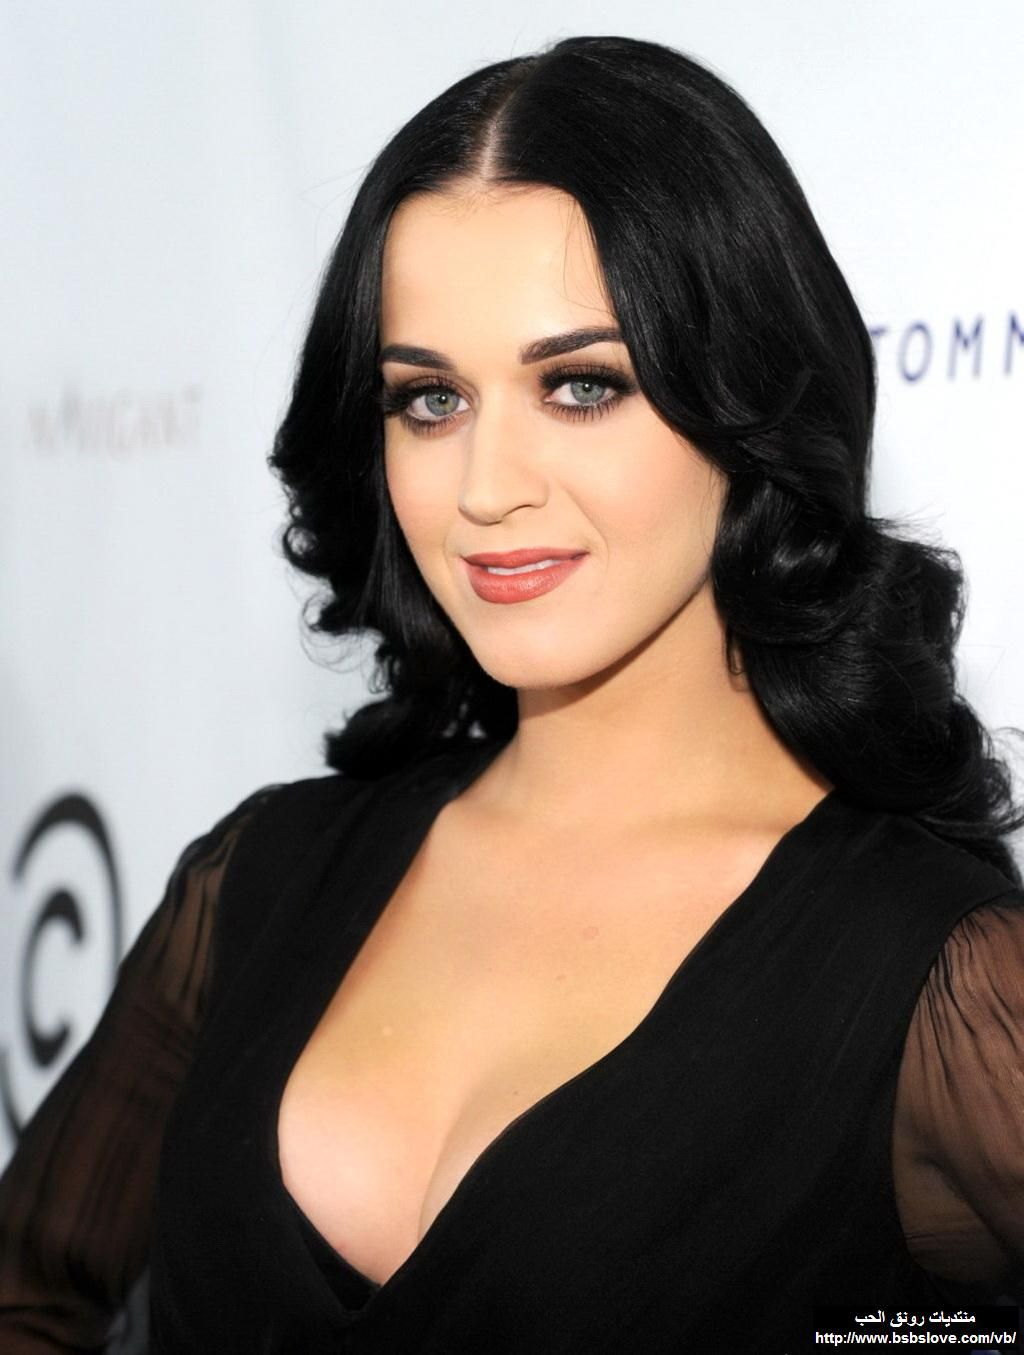 I just want to. Katy perry hair, Katy perry, Katy